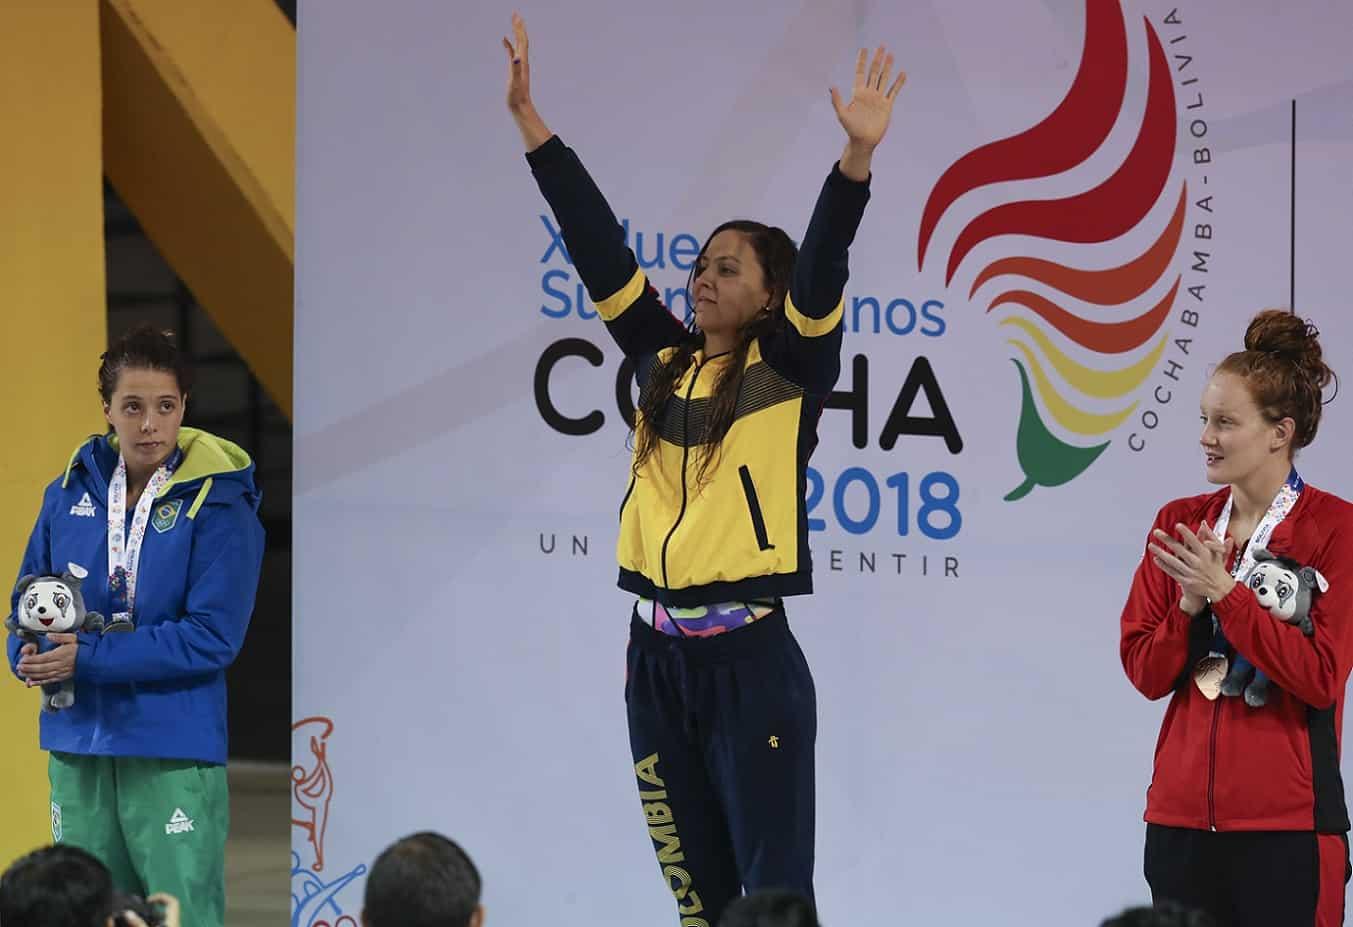 Juegos Suramericanos de Cochabamba 2018